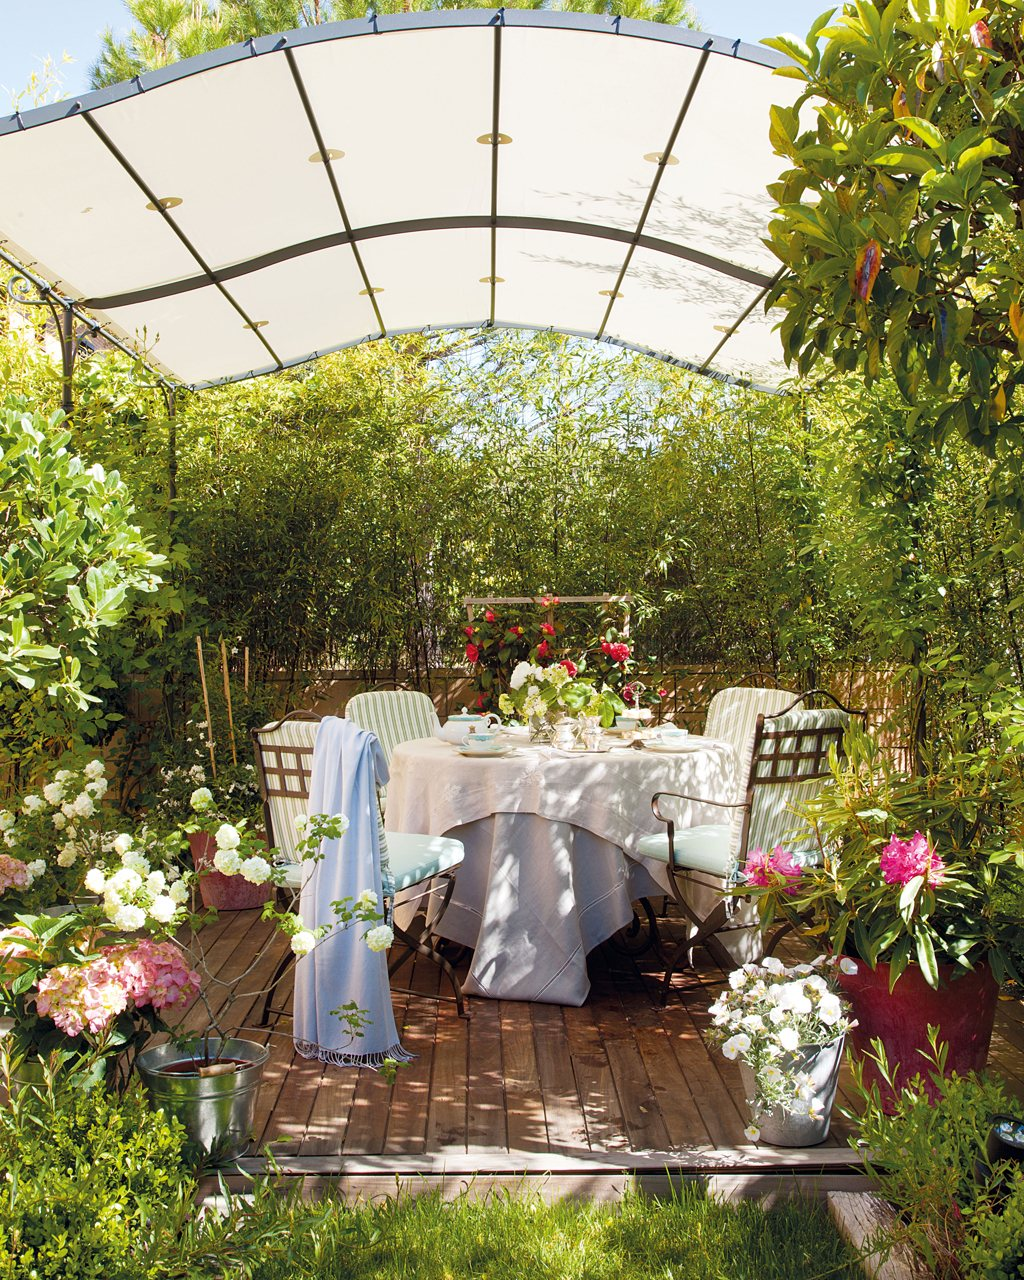 Pergola de jardin baratas - Pergolas para jardin baratas ...